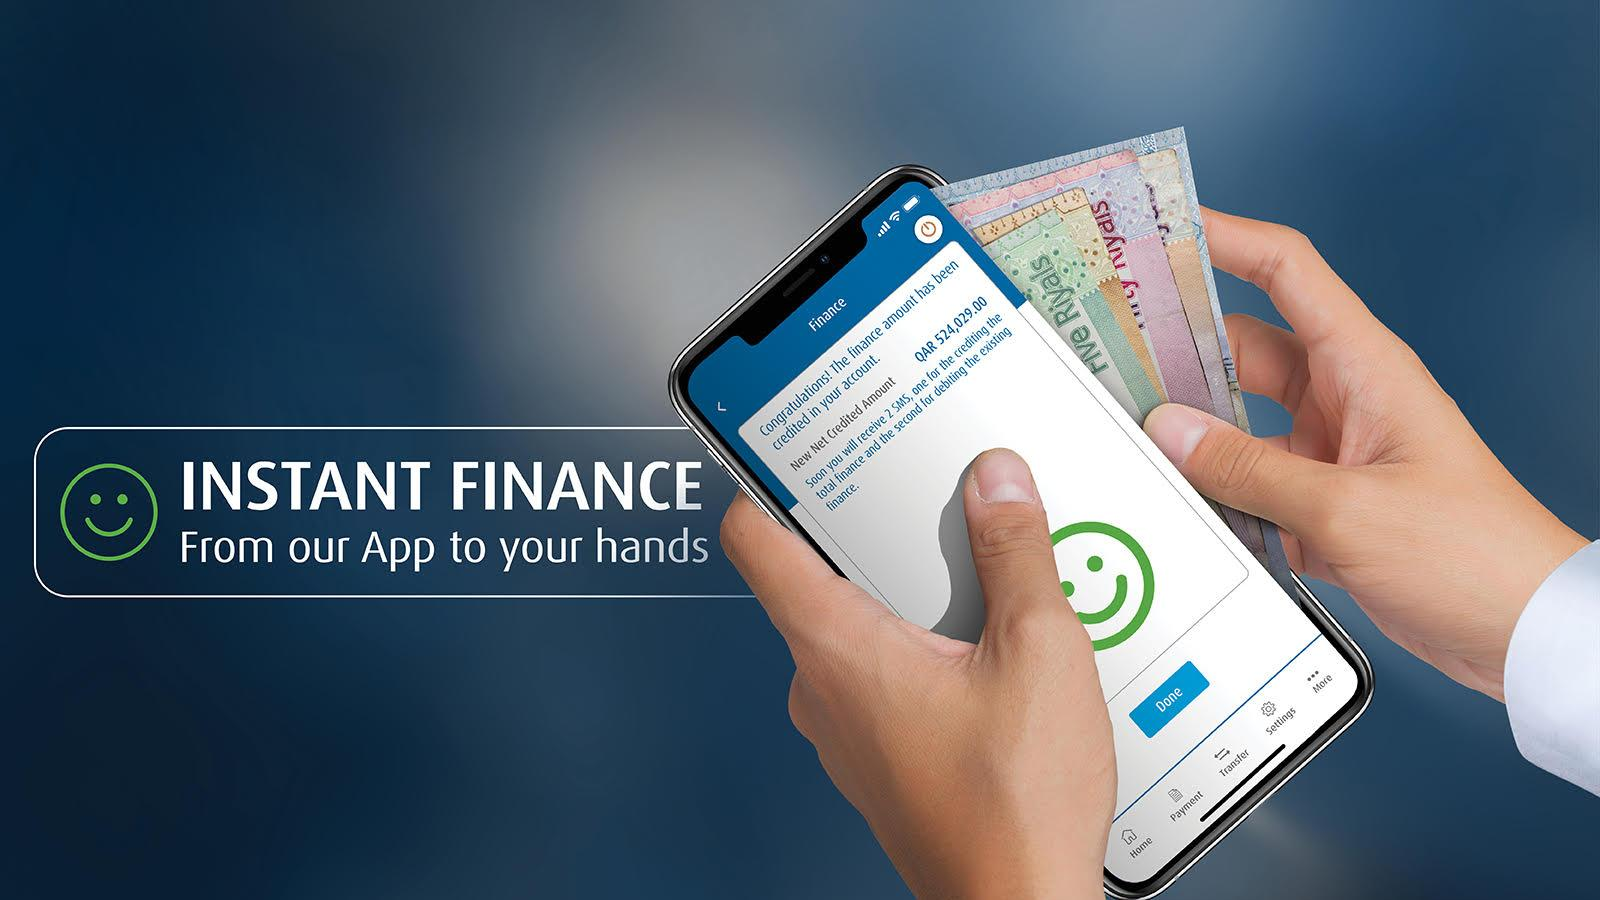 QIB redefines banking experience through award-winning mobile app